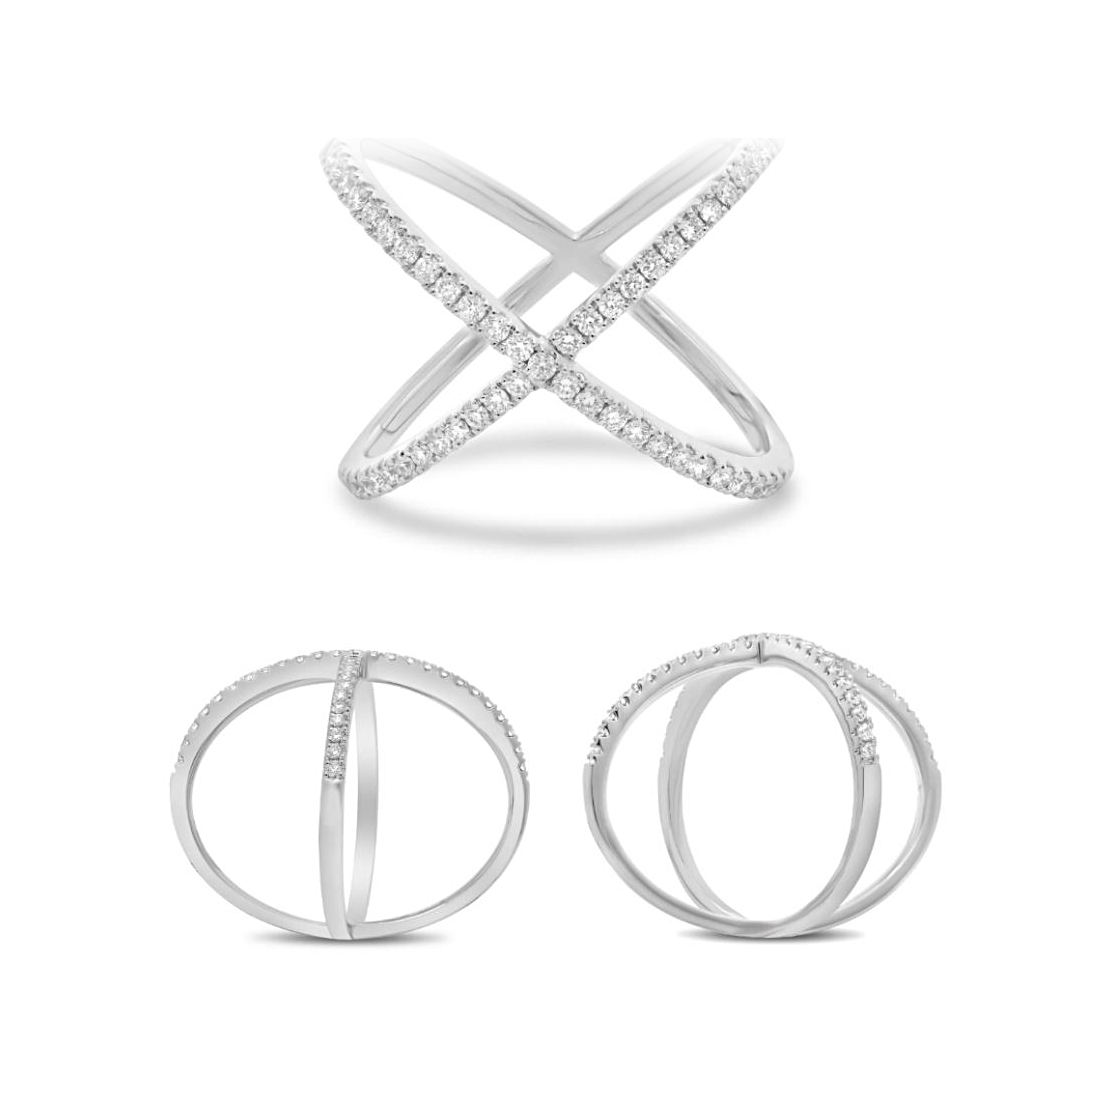 14 Karat White Gold Diamond Criss Cross Ring